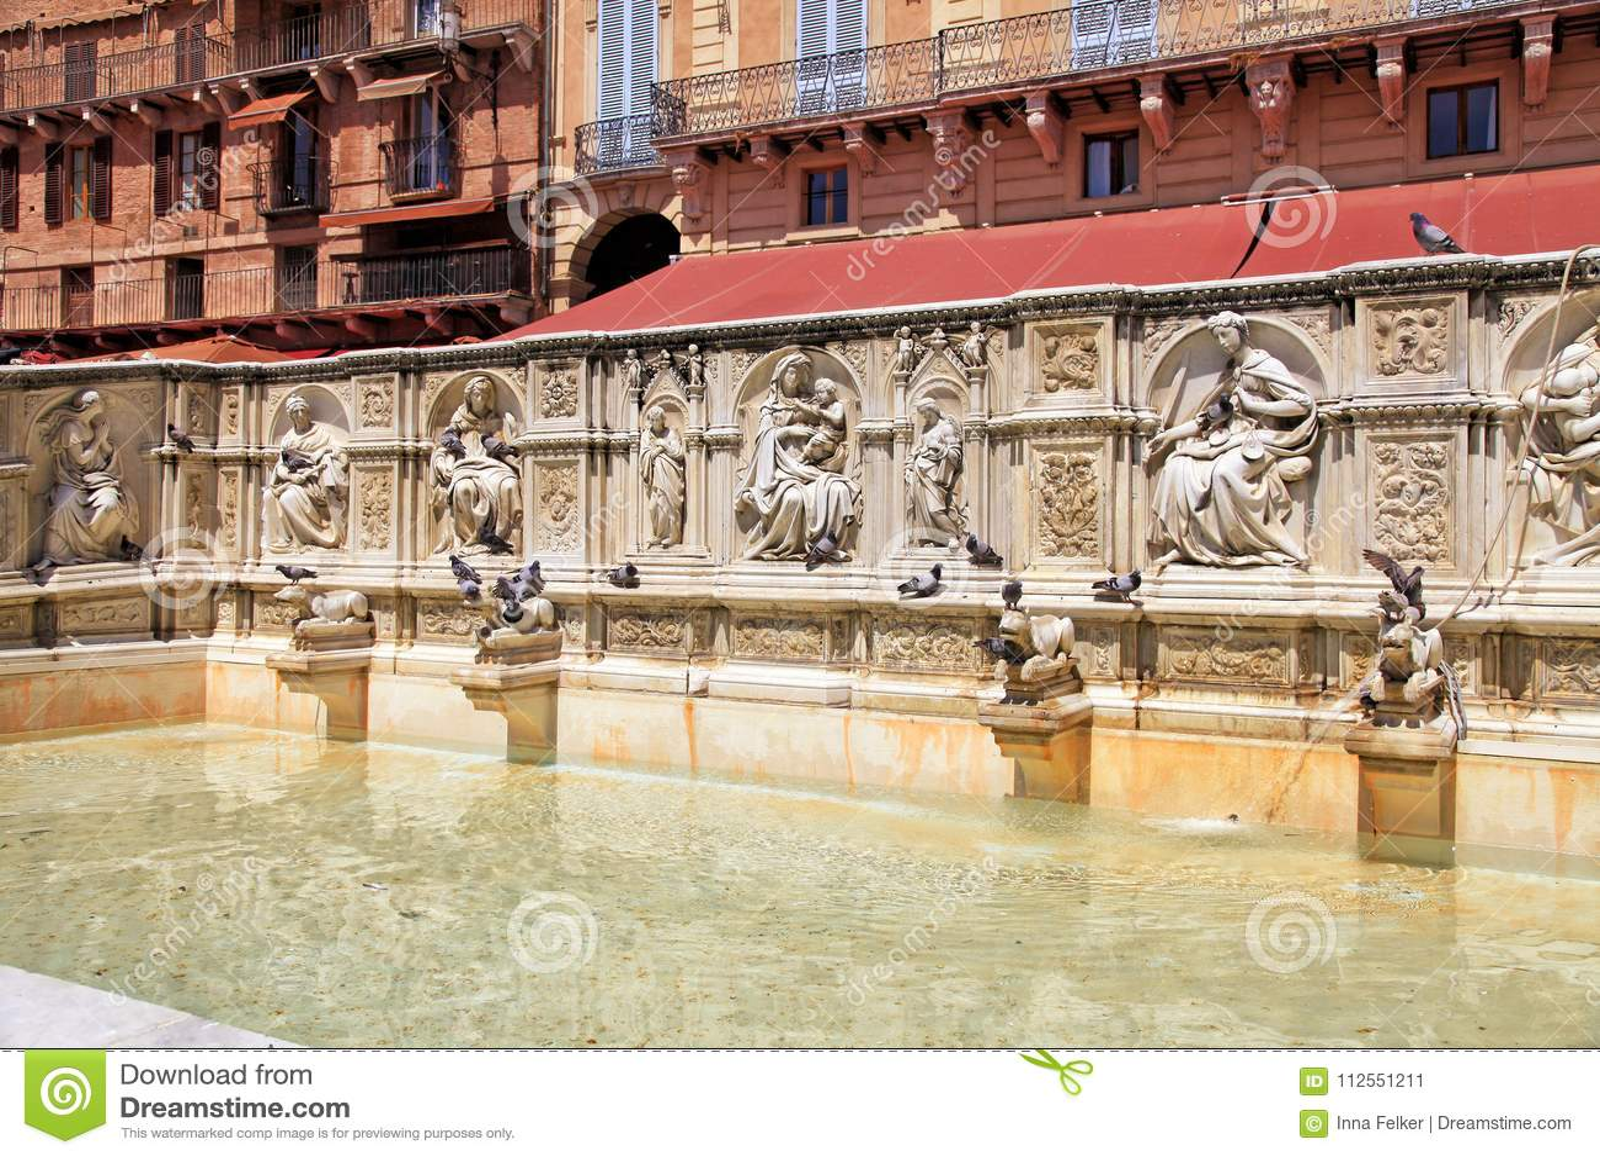 Beautiful Fountain of Joy on central square Piazza del Campo, Si